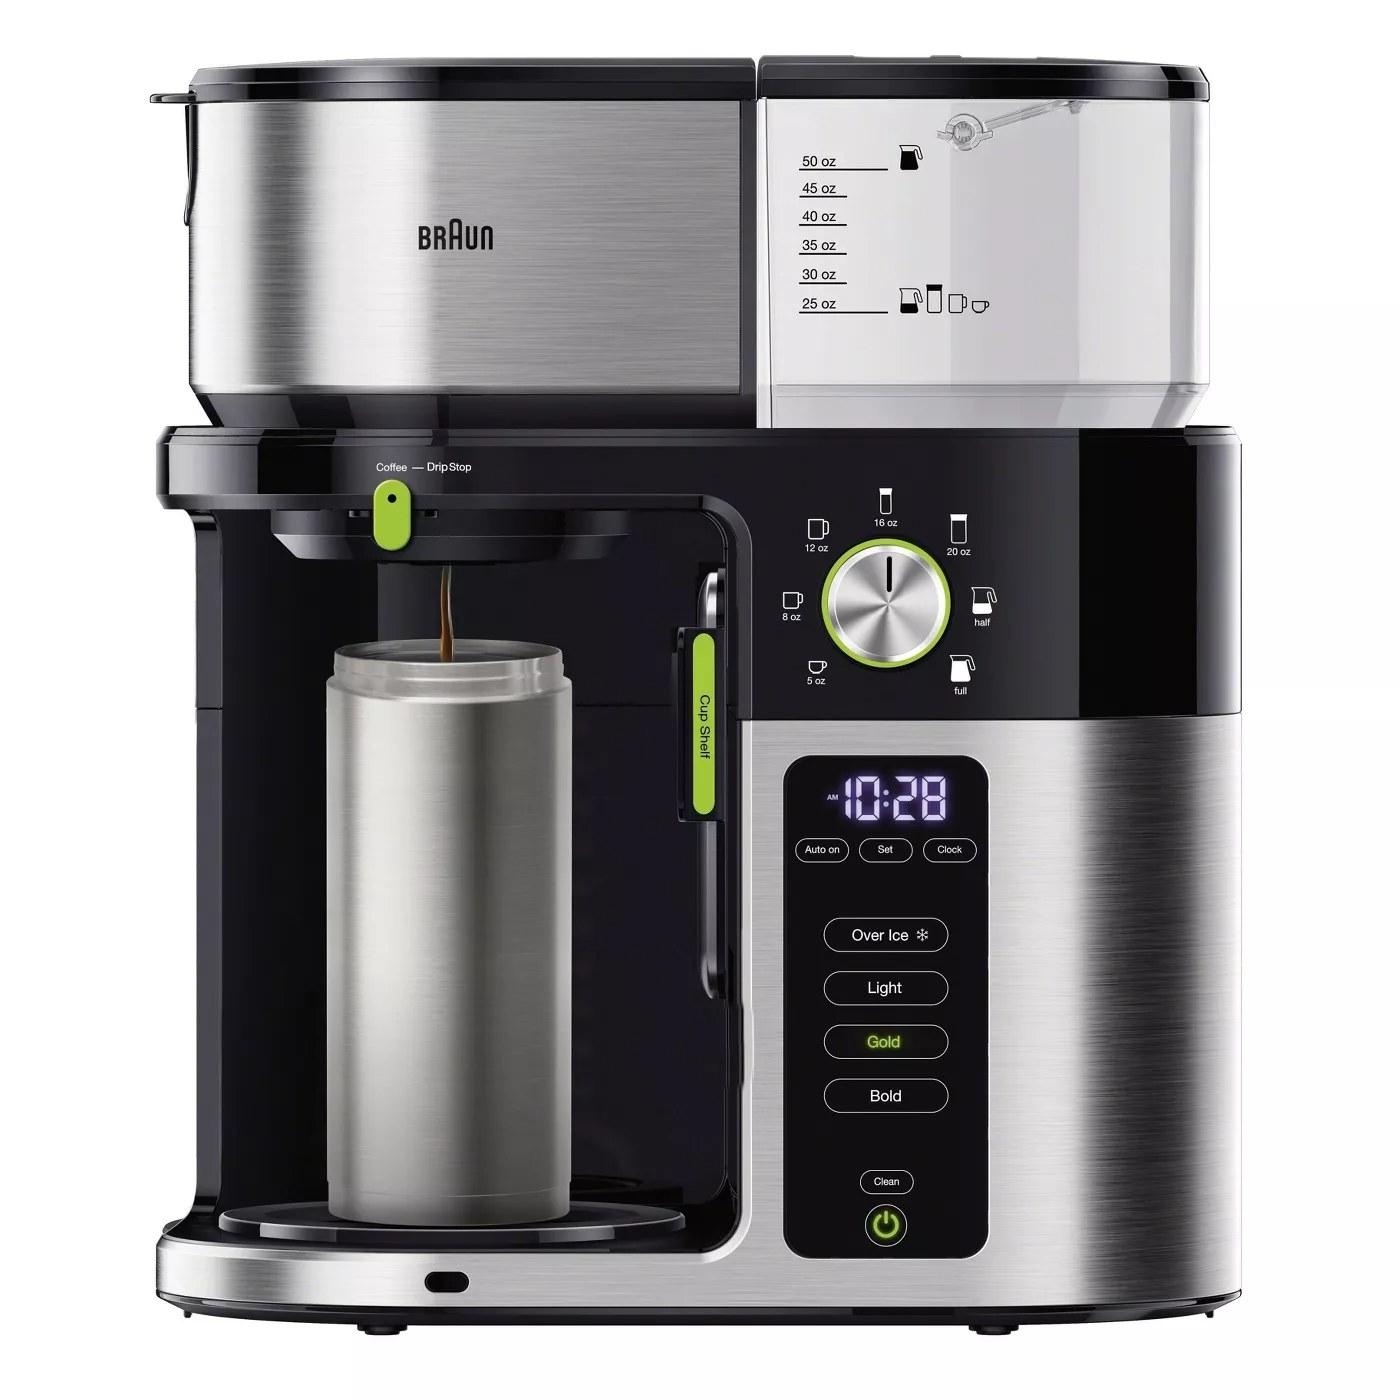 The Braun drip coffee maker